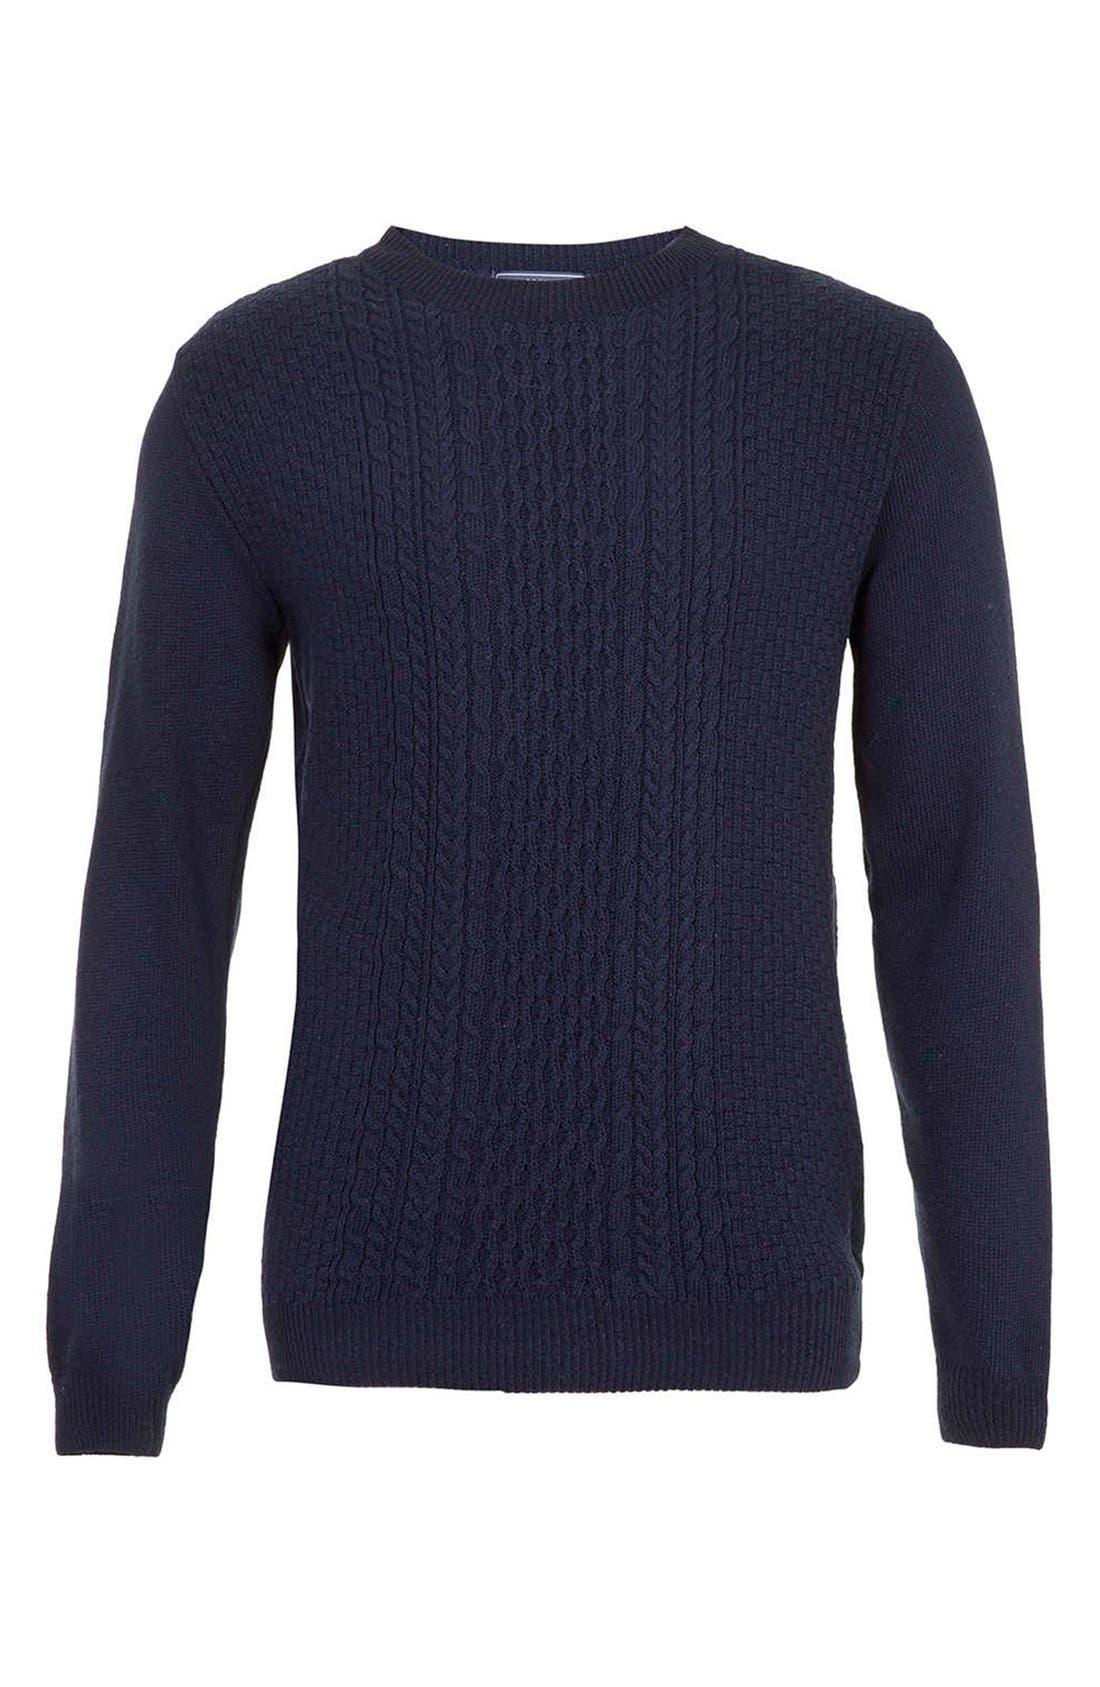 Main Image - Topman Cable Knit Crewneck Sweater